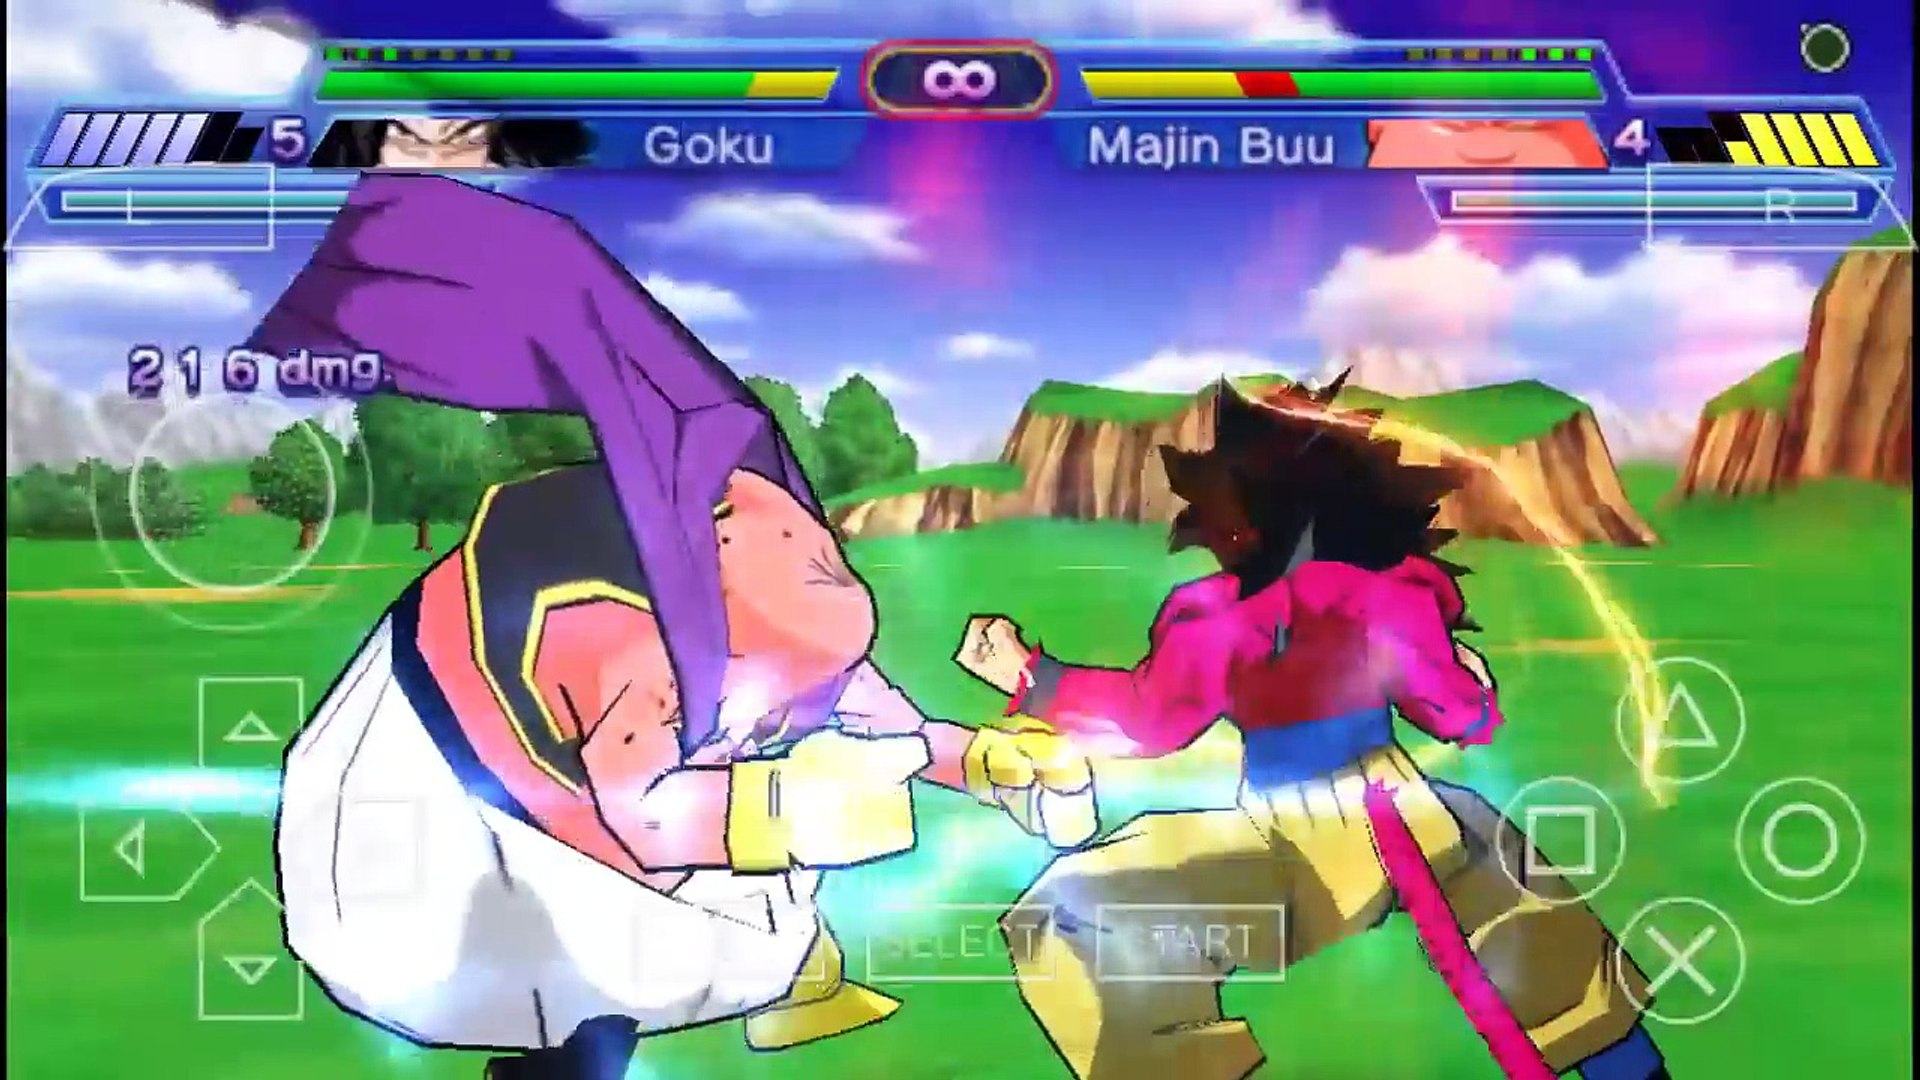 Dragon Ball Z Shin Budokai 2 Unlock All characters PSP Android